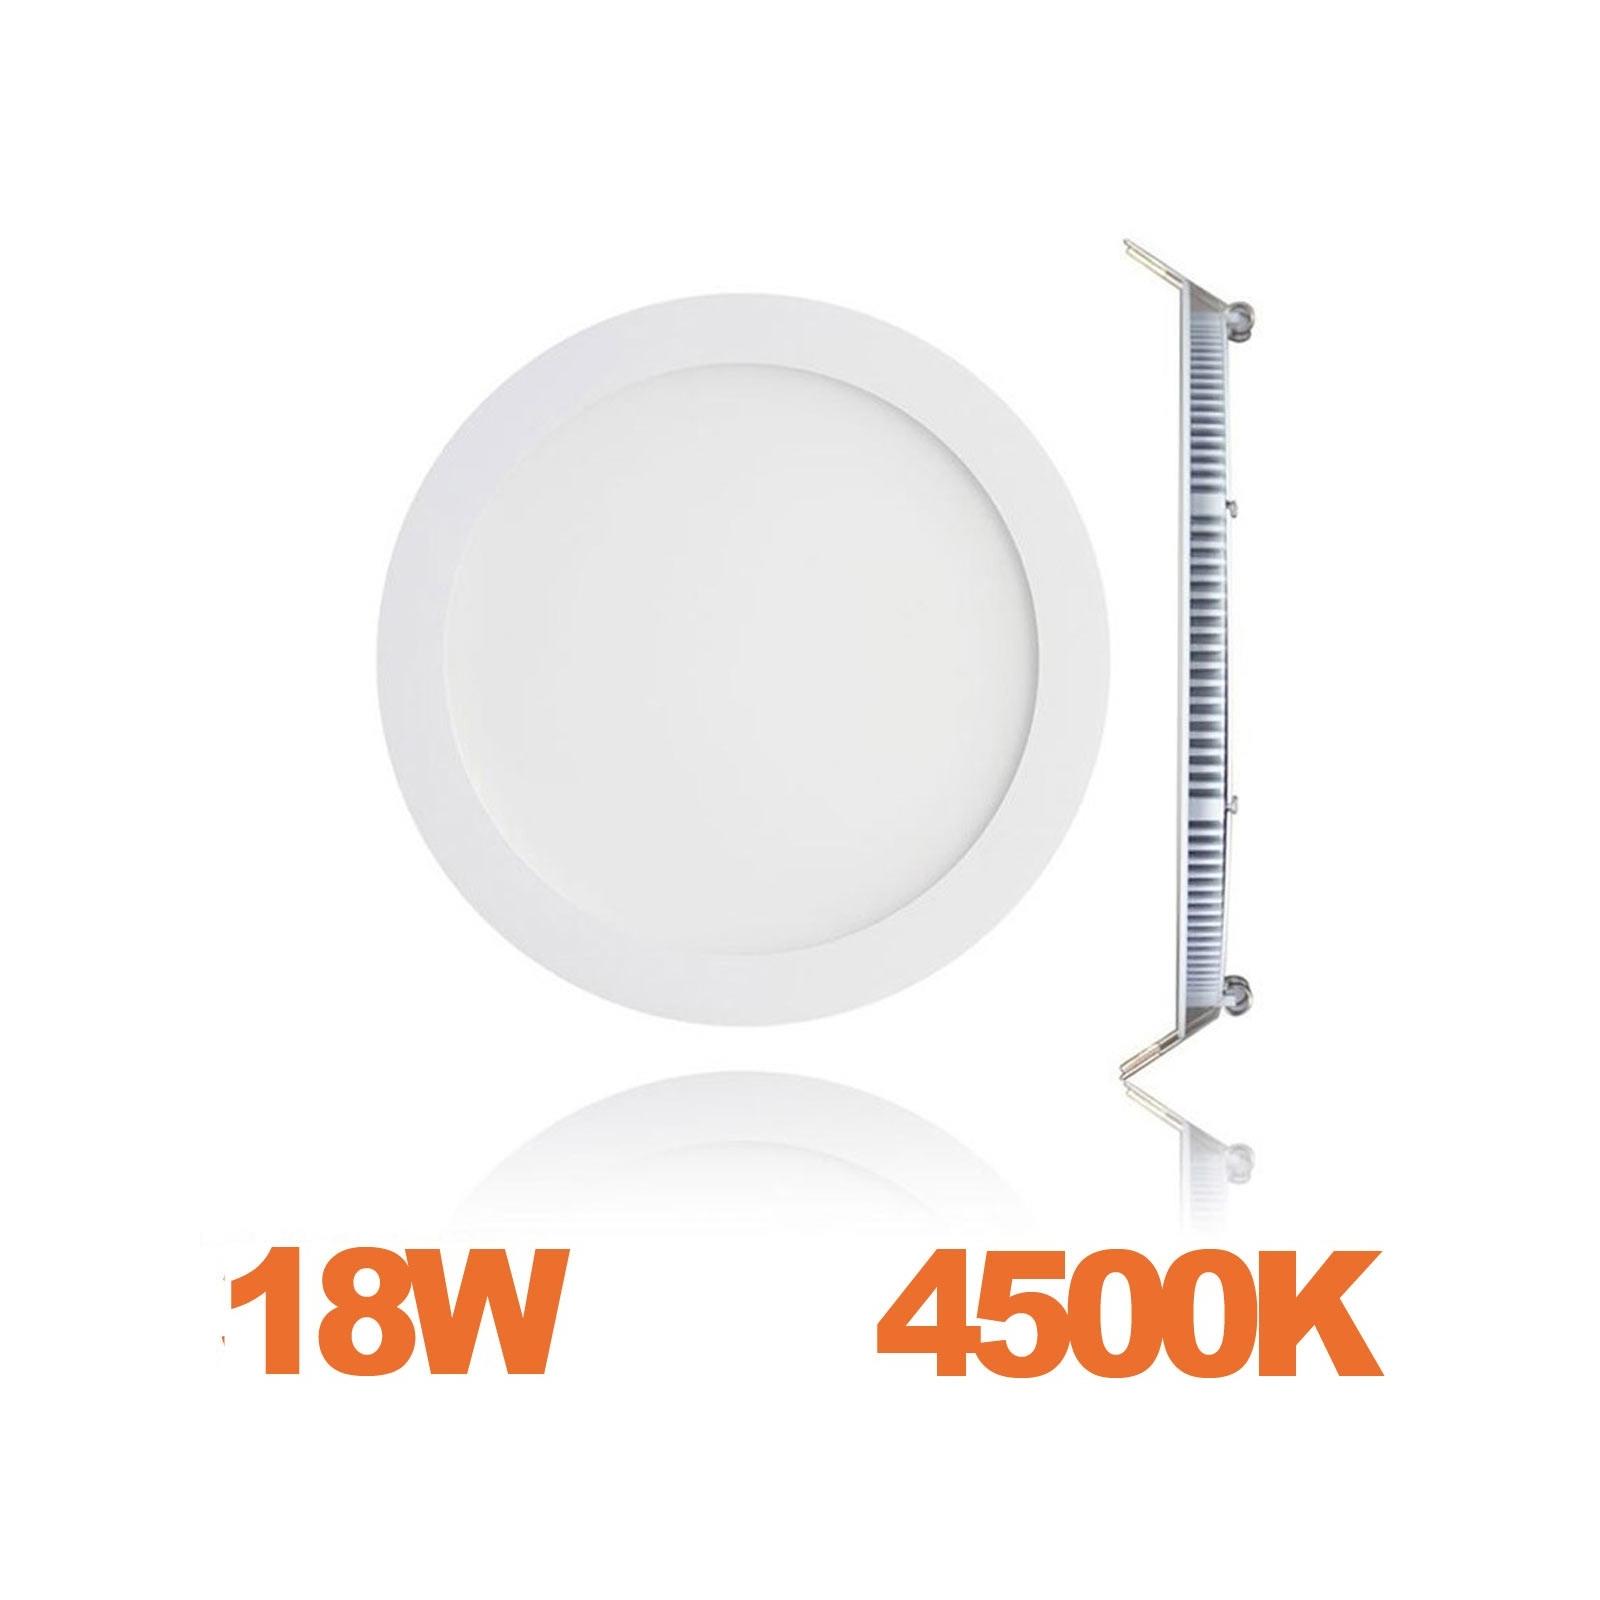 Spot Encastrable LED Downlight Panel Extra-Plat 18W Blanc Neutre 4500K